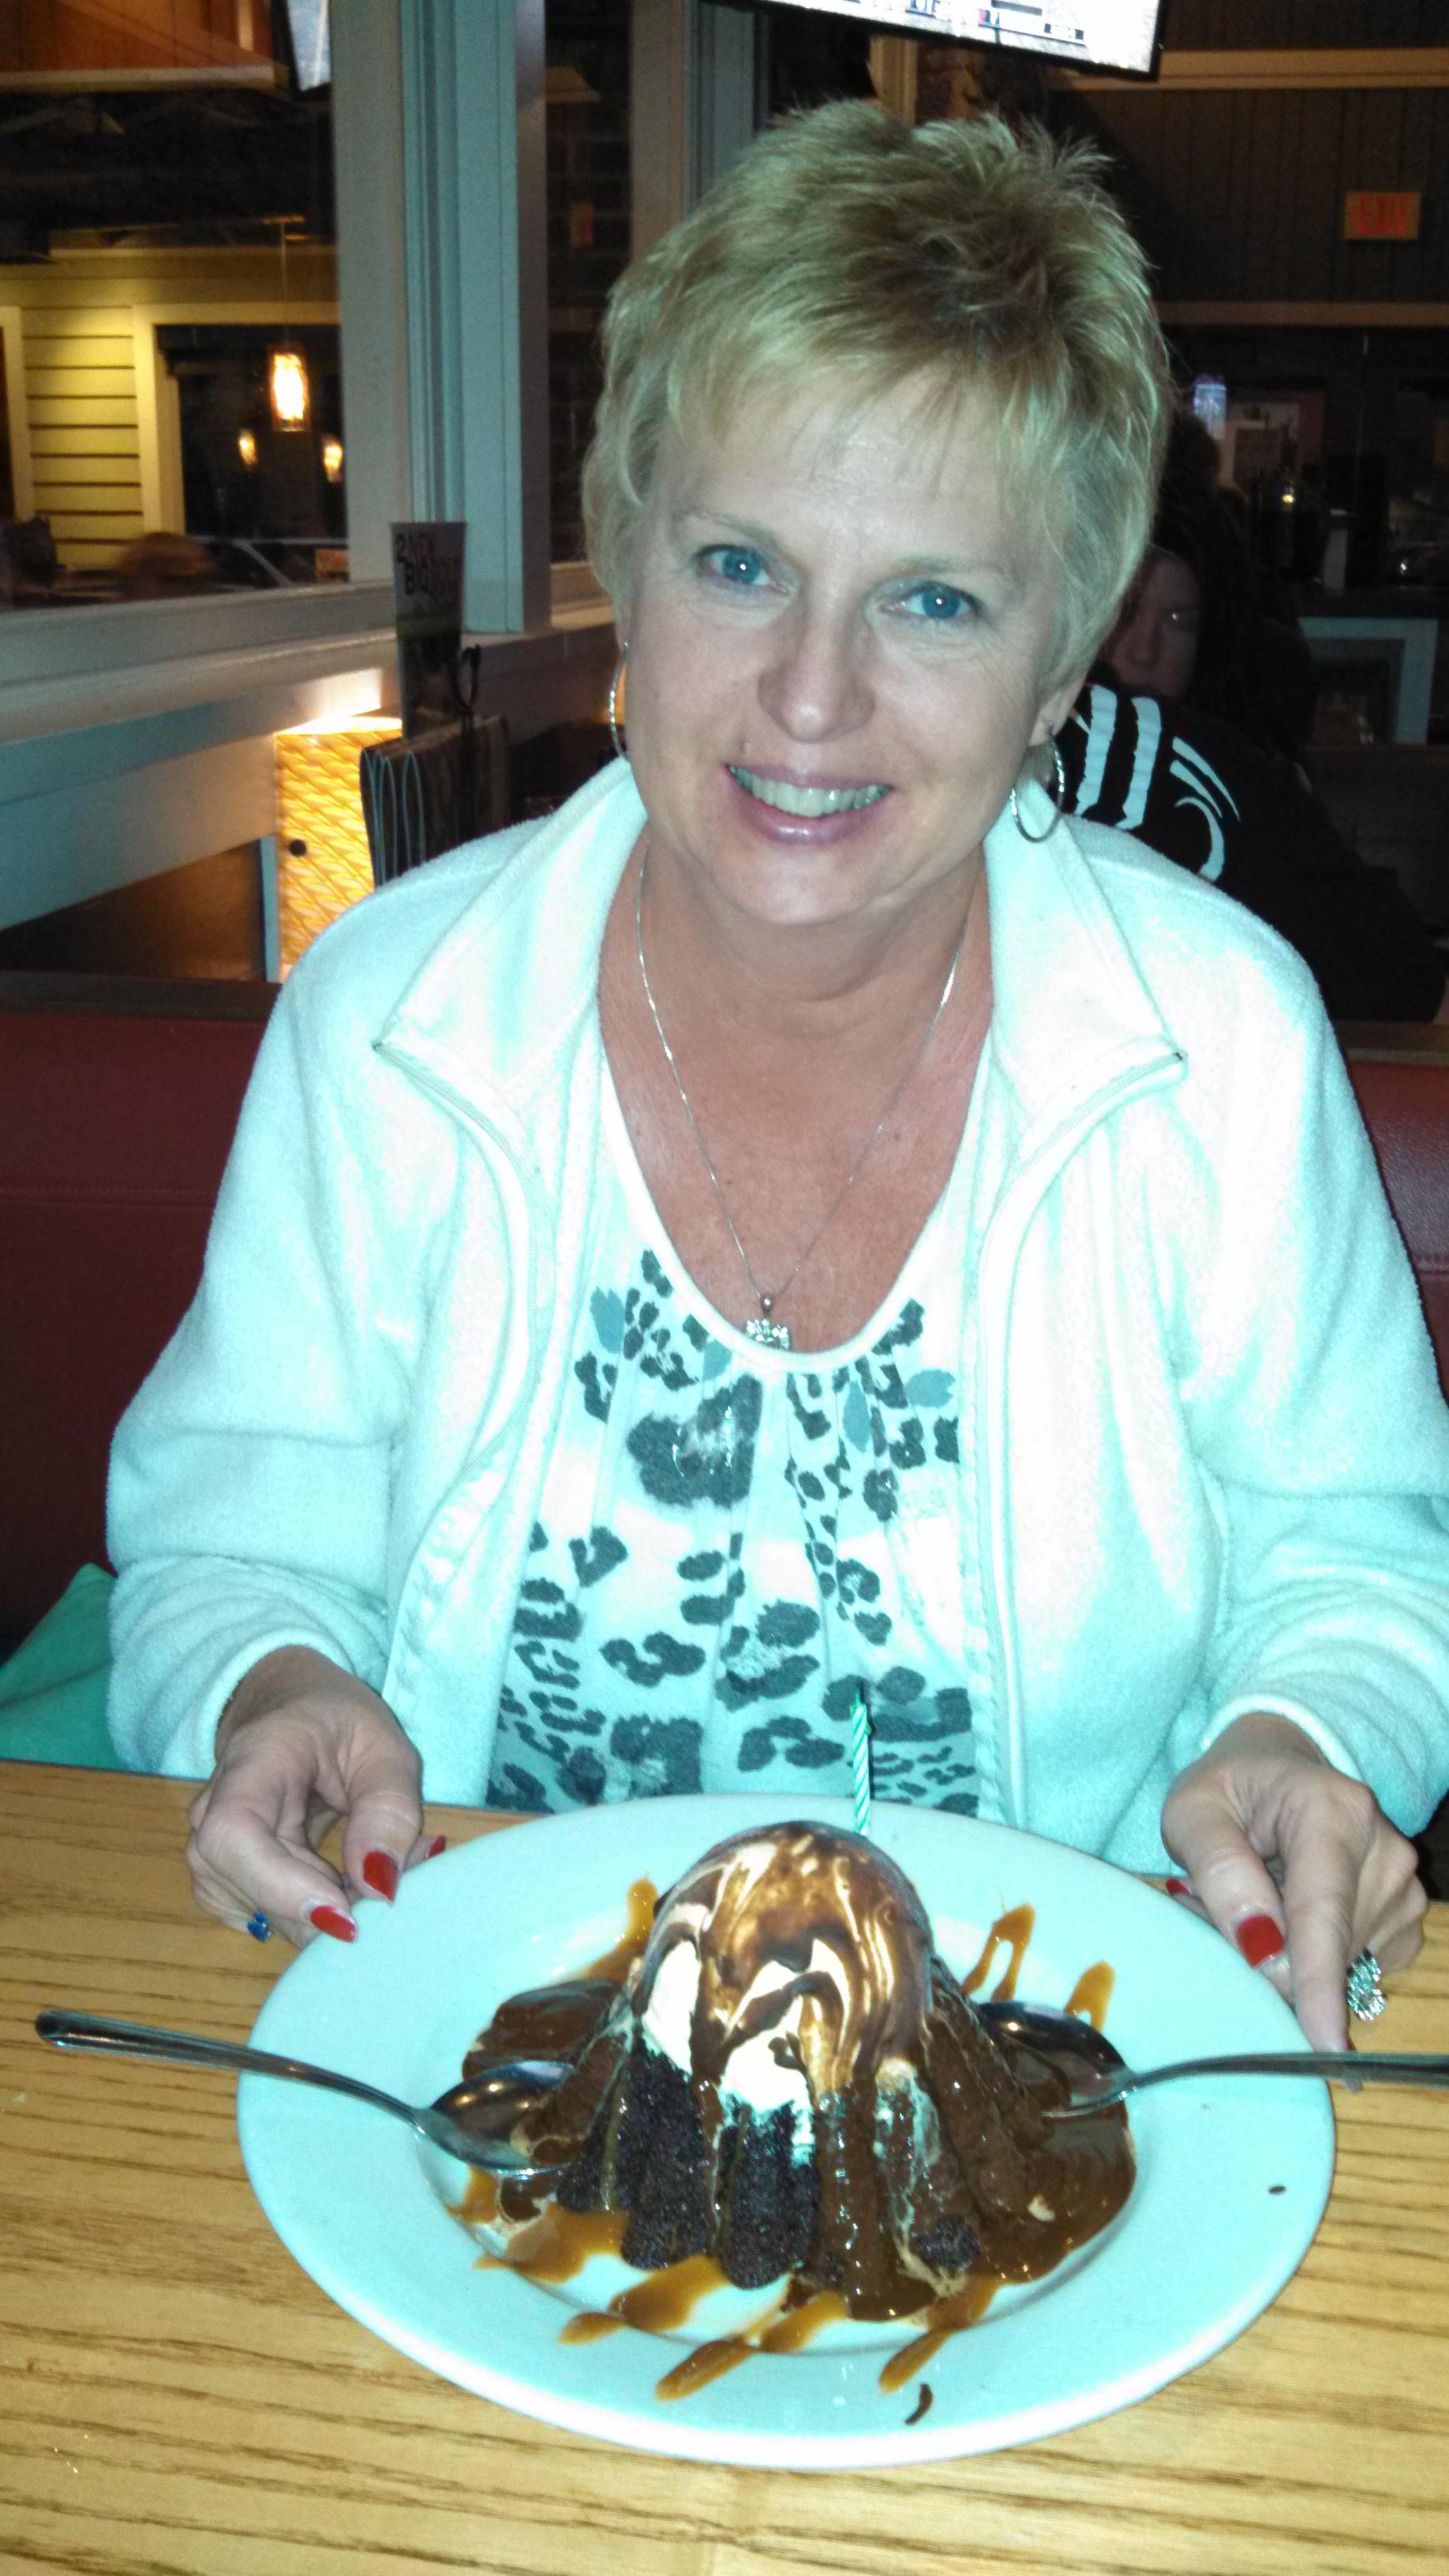 Free dessert at Chilli's for my birthday!